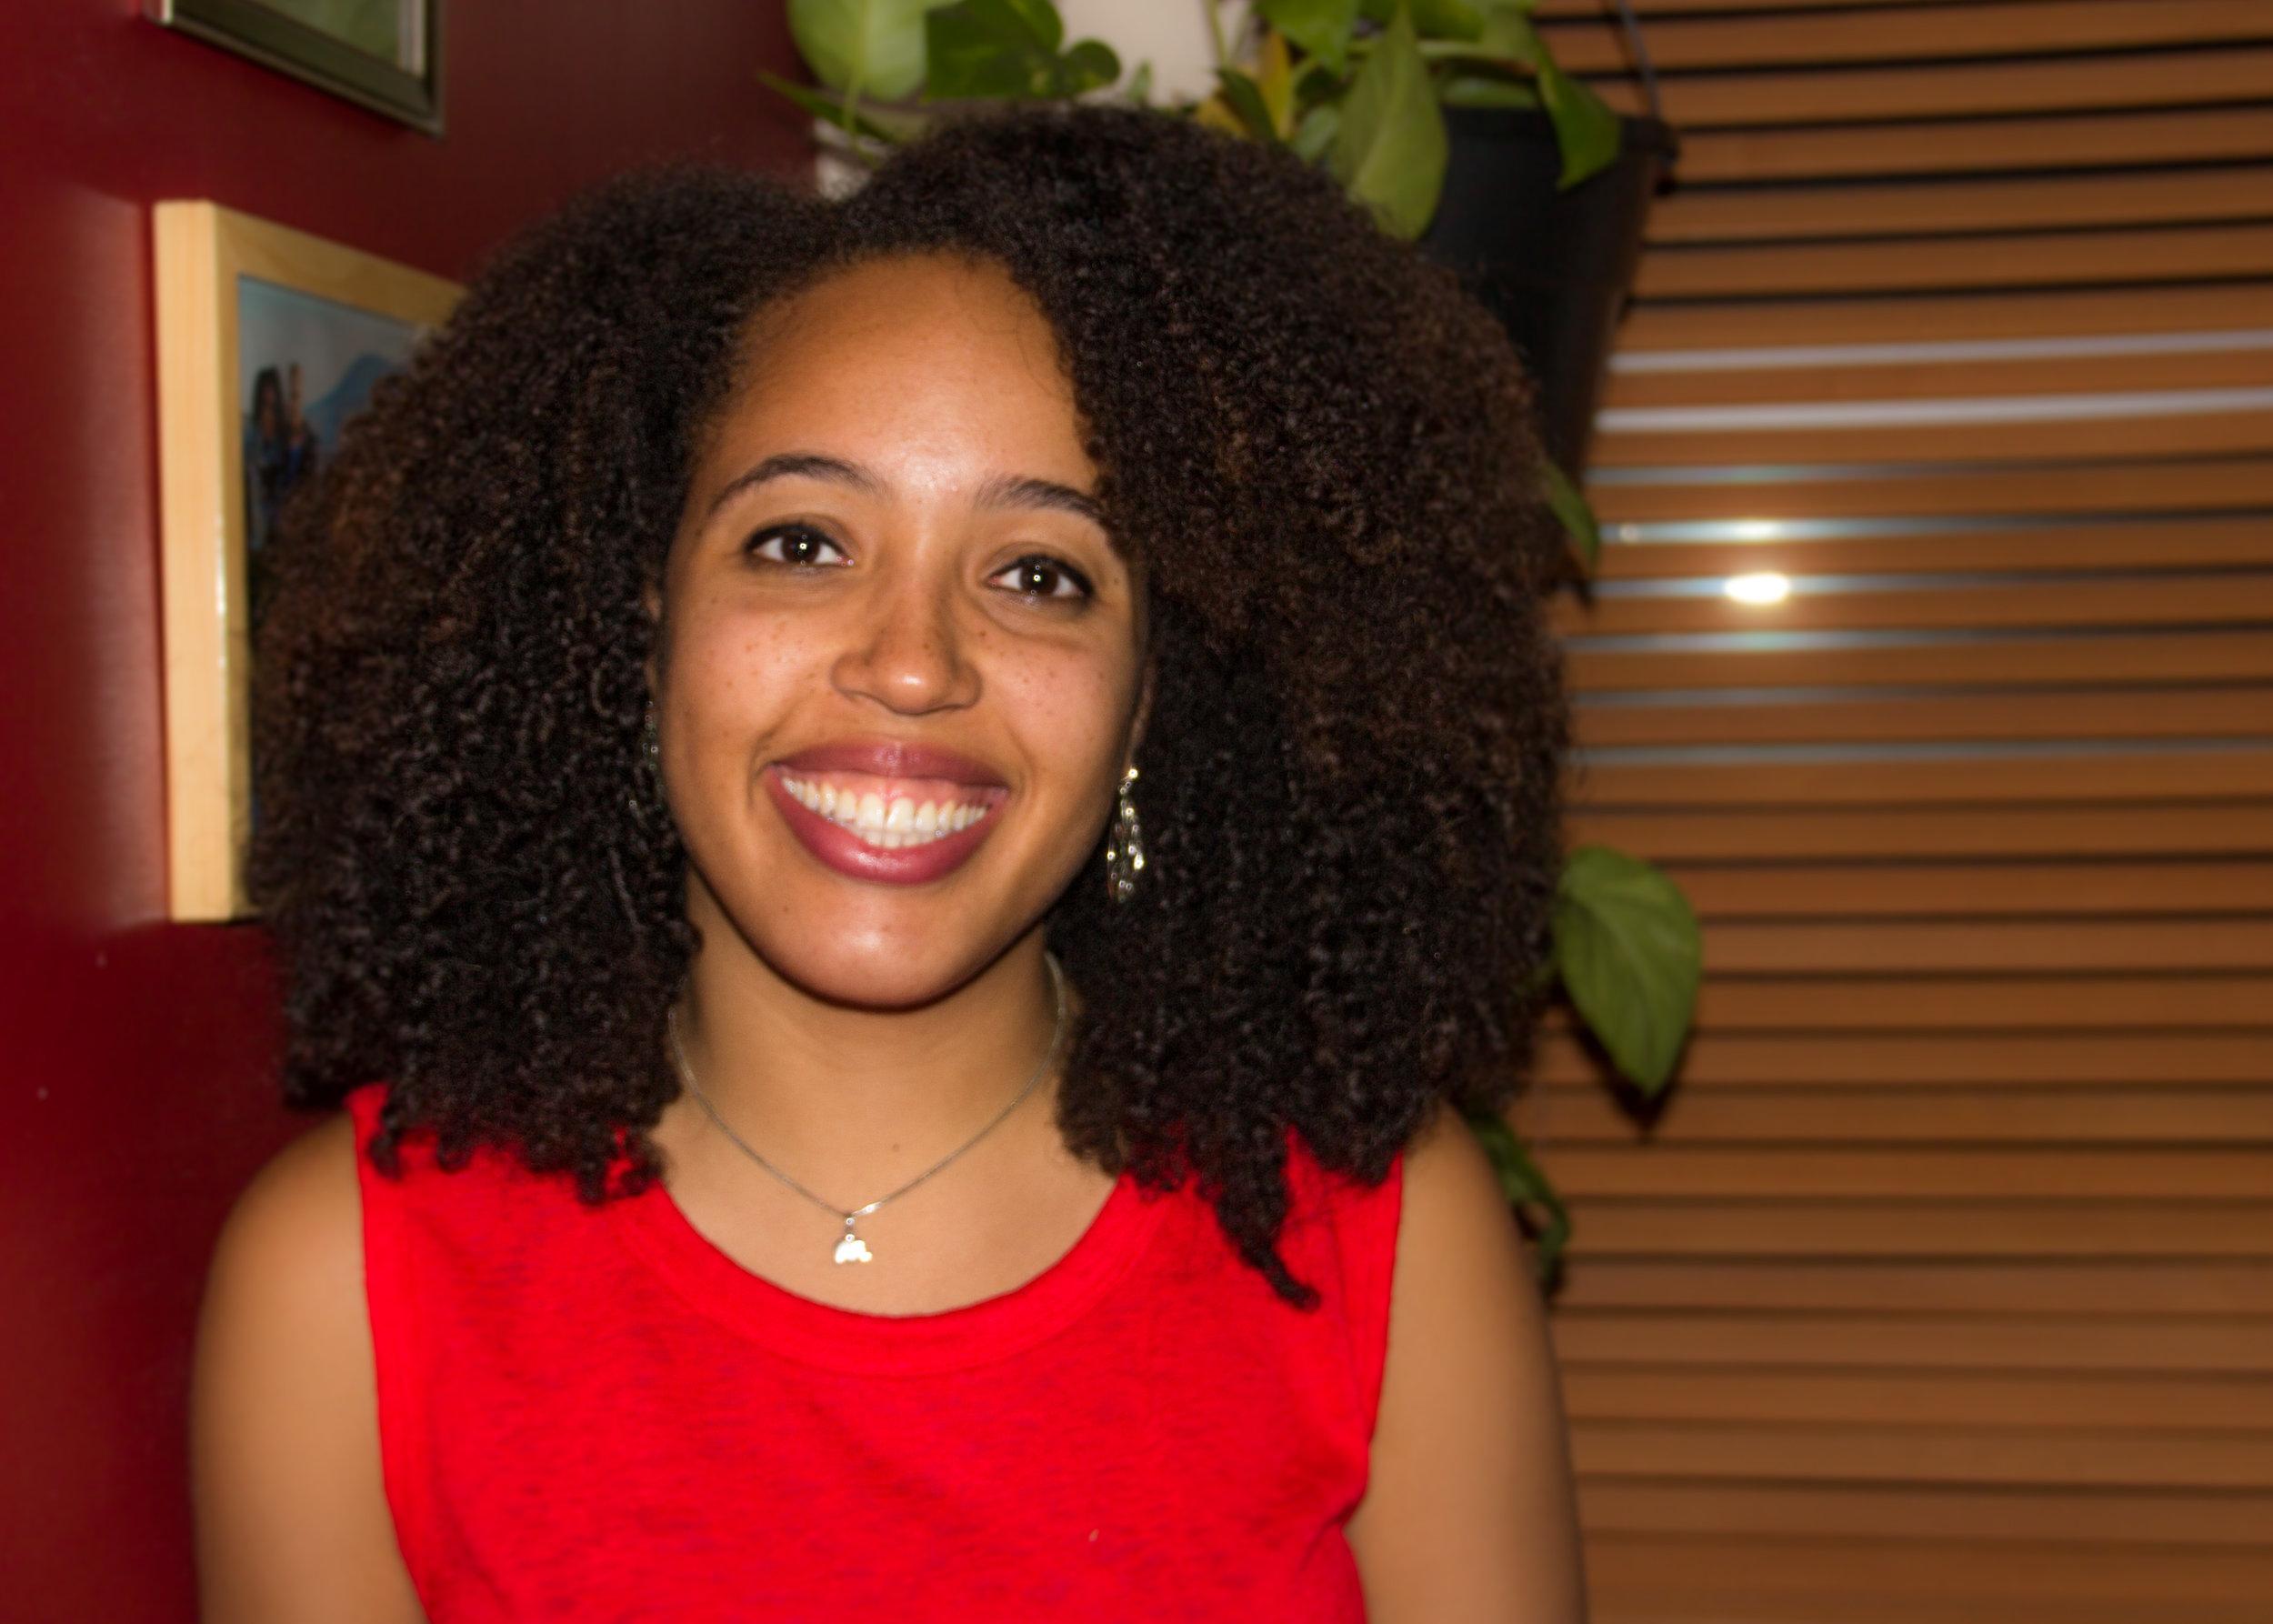 Melanie Schaffler - Neuroscience PhD StudentB.A., Wesleyan Universityschmel@pennmedicine.upenn.edu